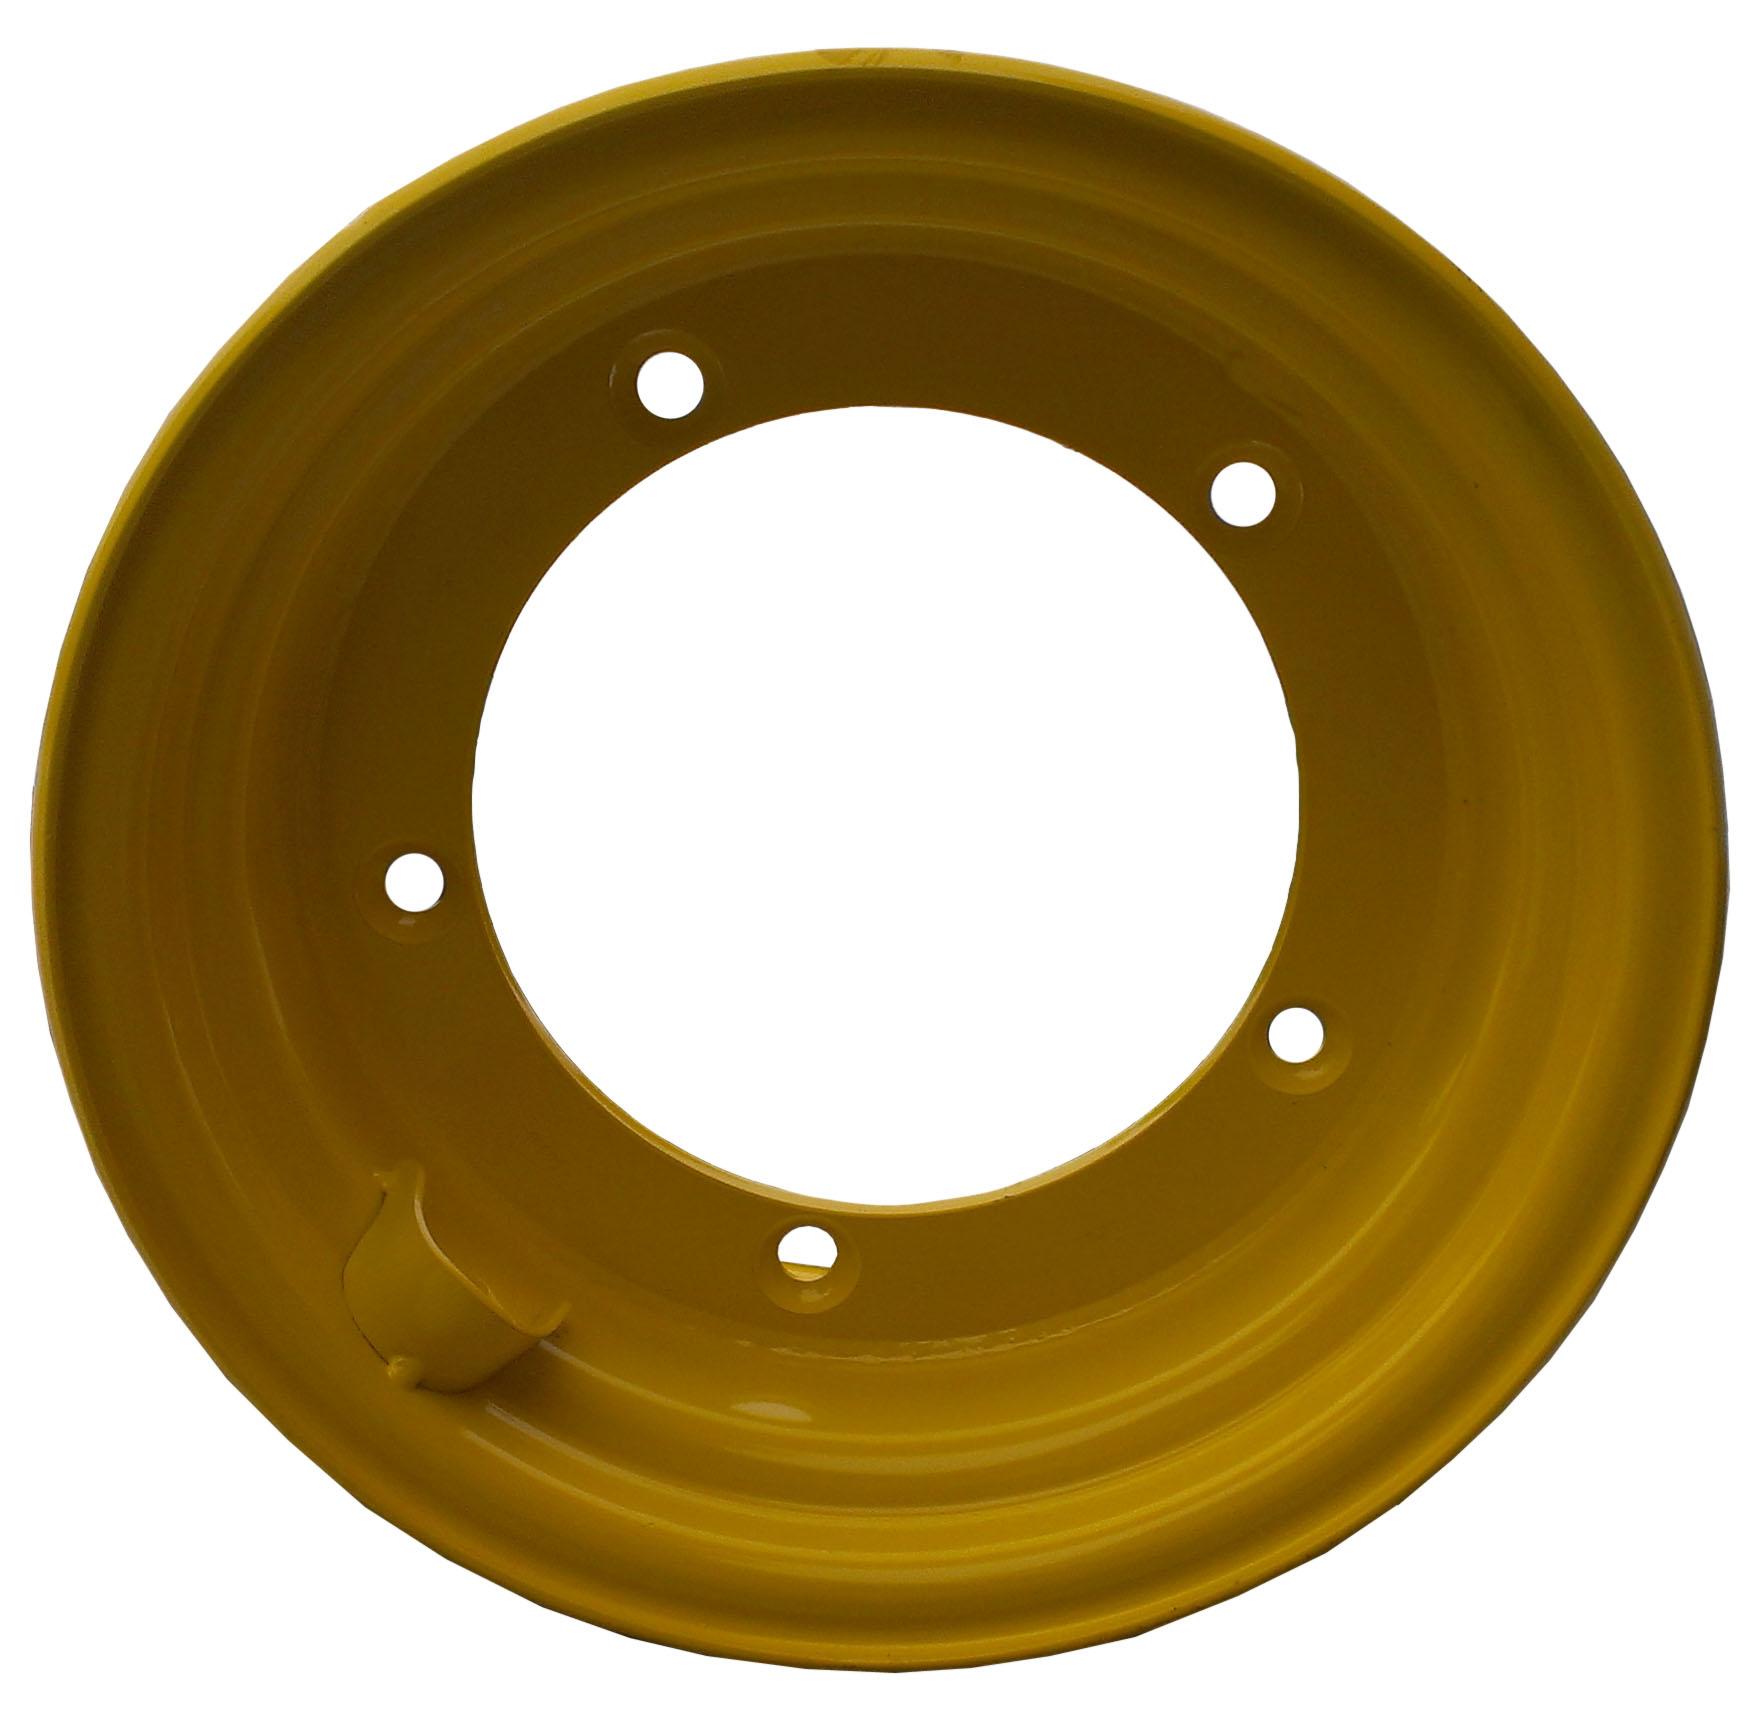 диски для экскаваторов jcb 3cx, jcb 4cx